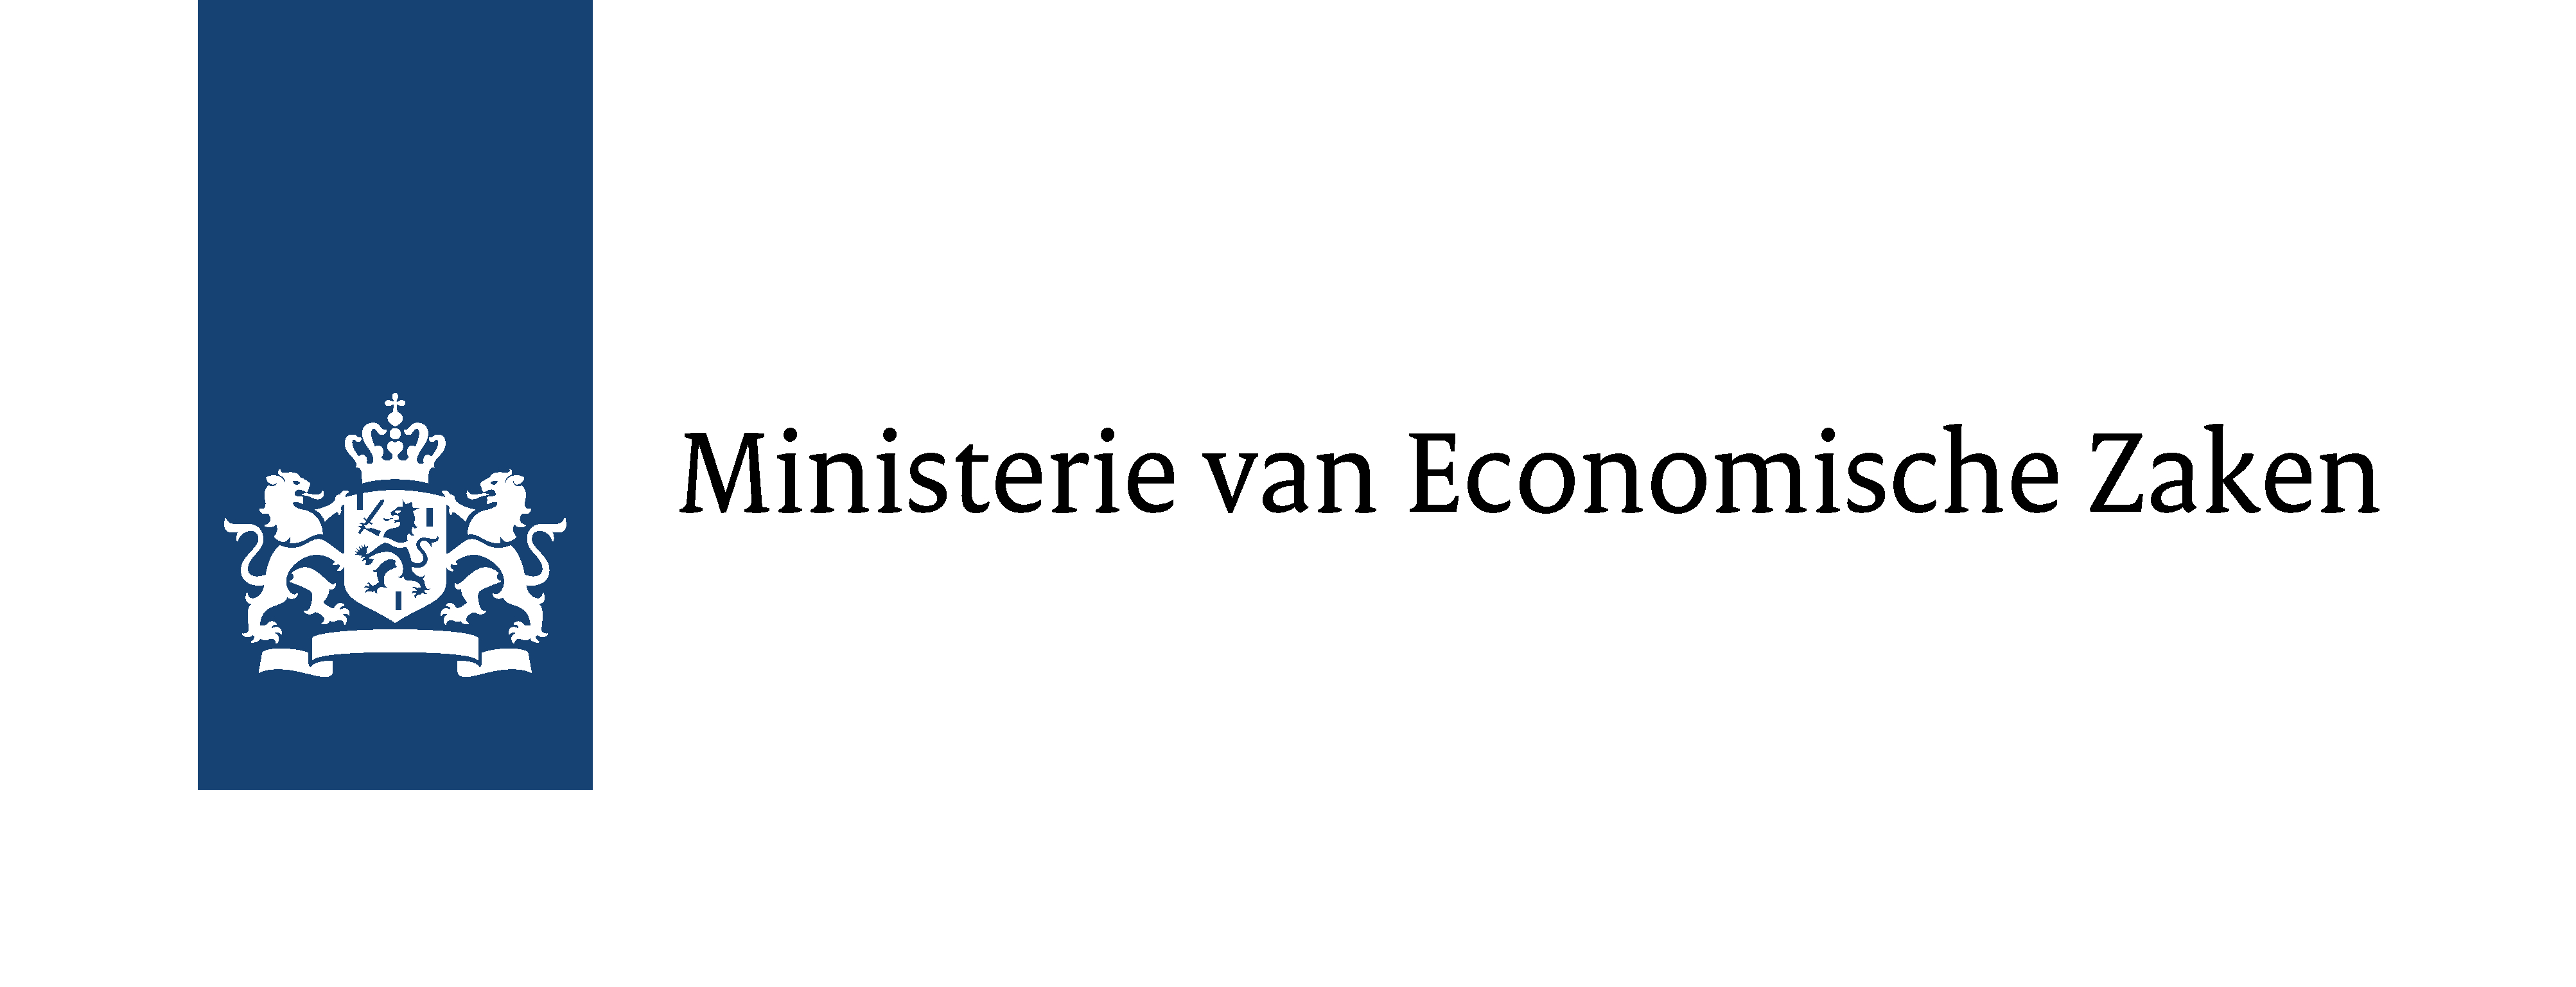 logo Ministerie van Economische Zaken_tcm109-408136